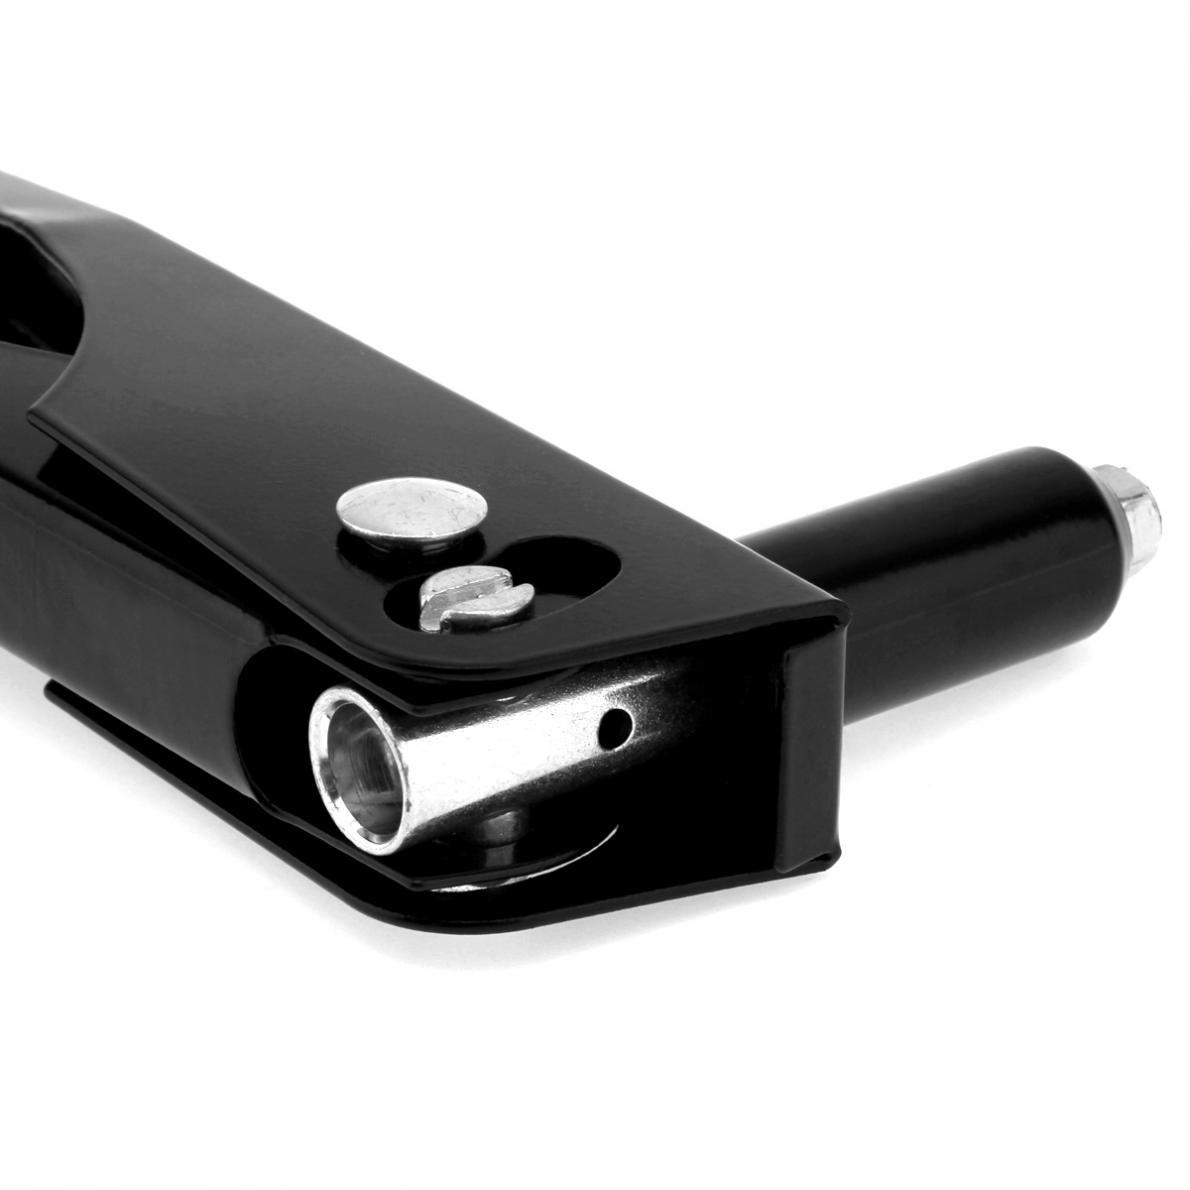 Image 5 - Hand Riveter Manual Light weight Rivet Gun Kit Blind Rivet Hand Tool Gutter Gutter Repair Heavy Duty Professional Tool-in Nail Guns from Tools on